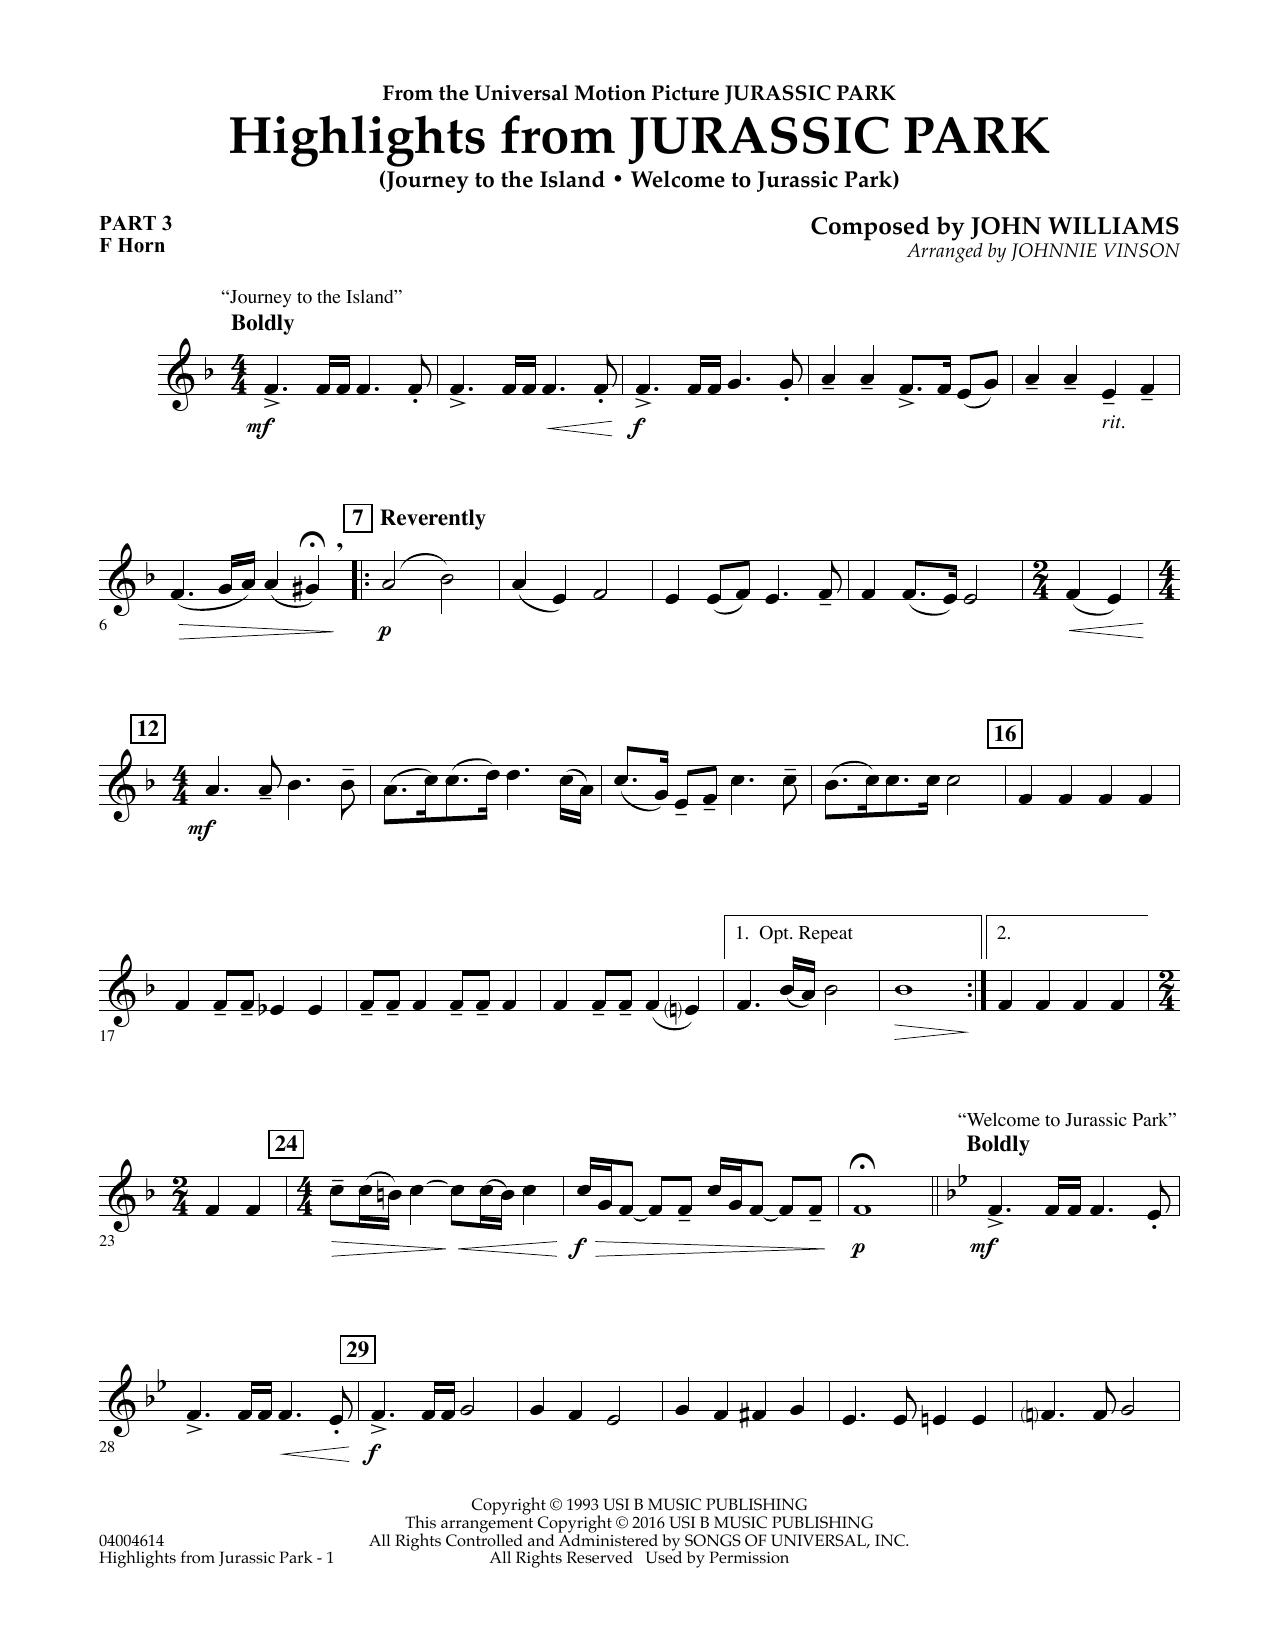 Highlights from Jurassic Park - Pt.3 - F Horn (Concert Band)